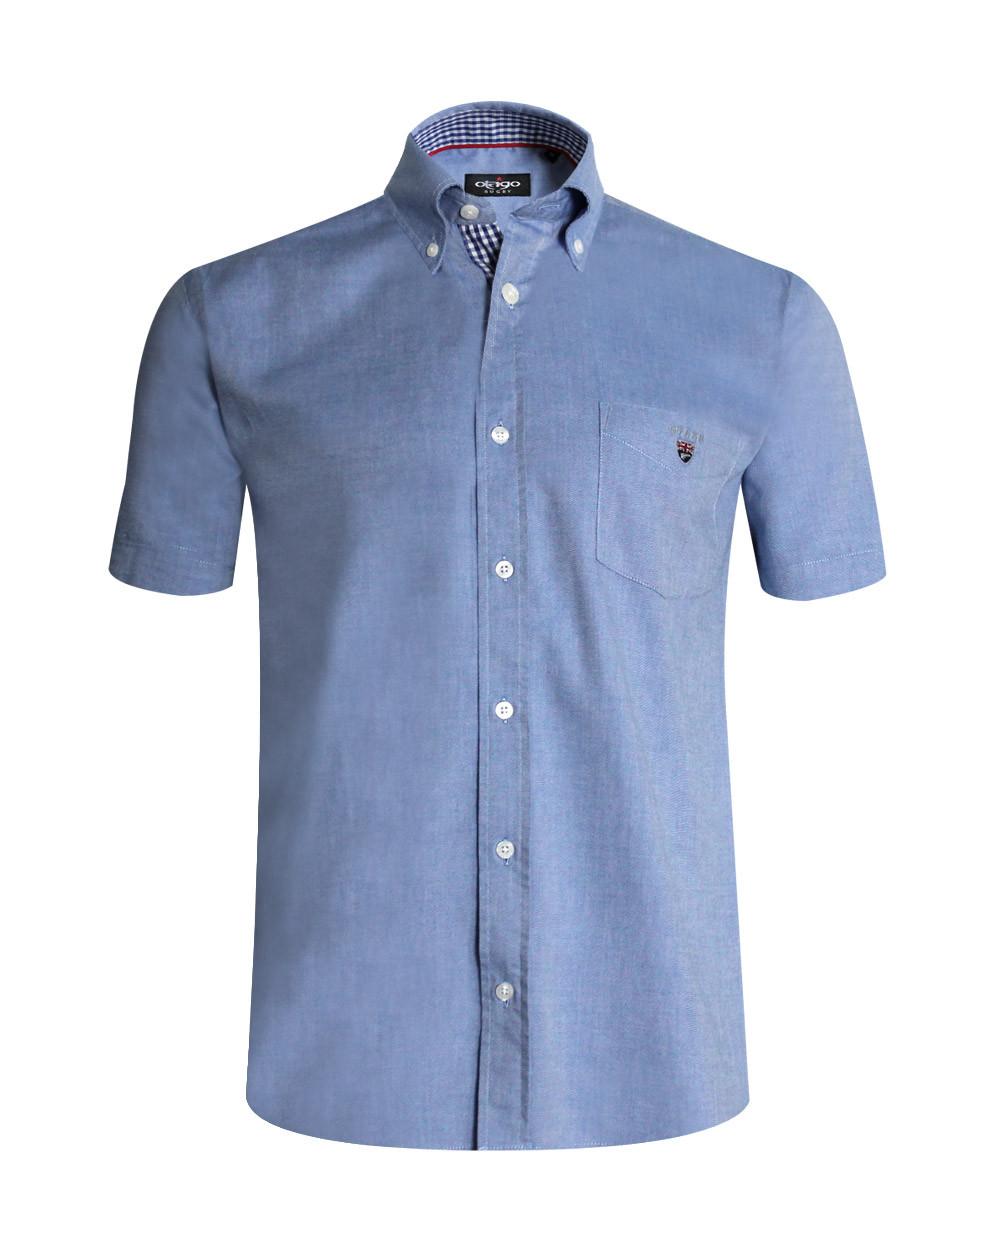 Chemise manches courtes Griff Oxford Otago bleu marine homme